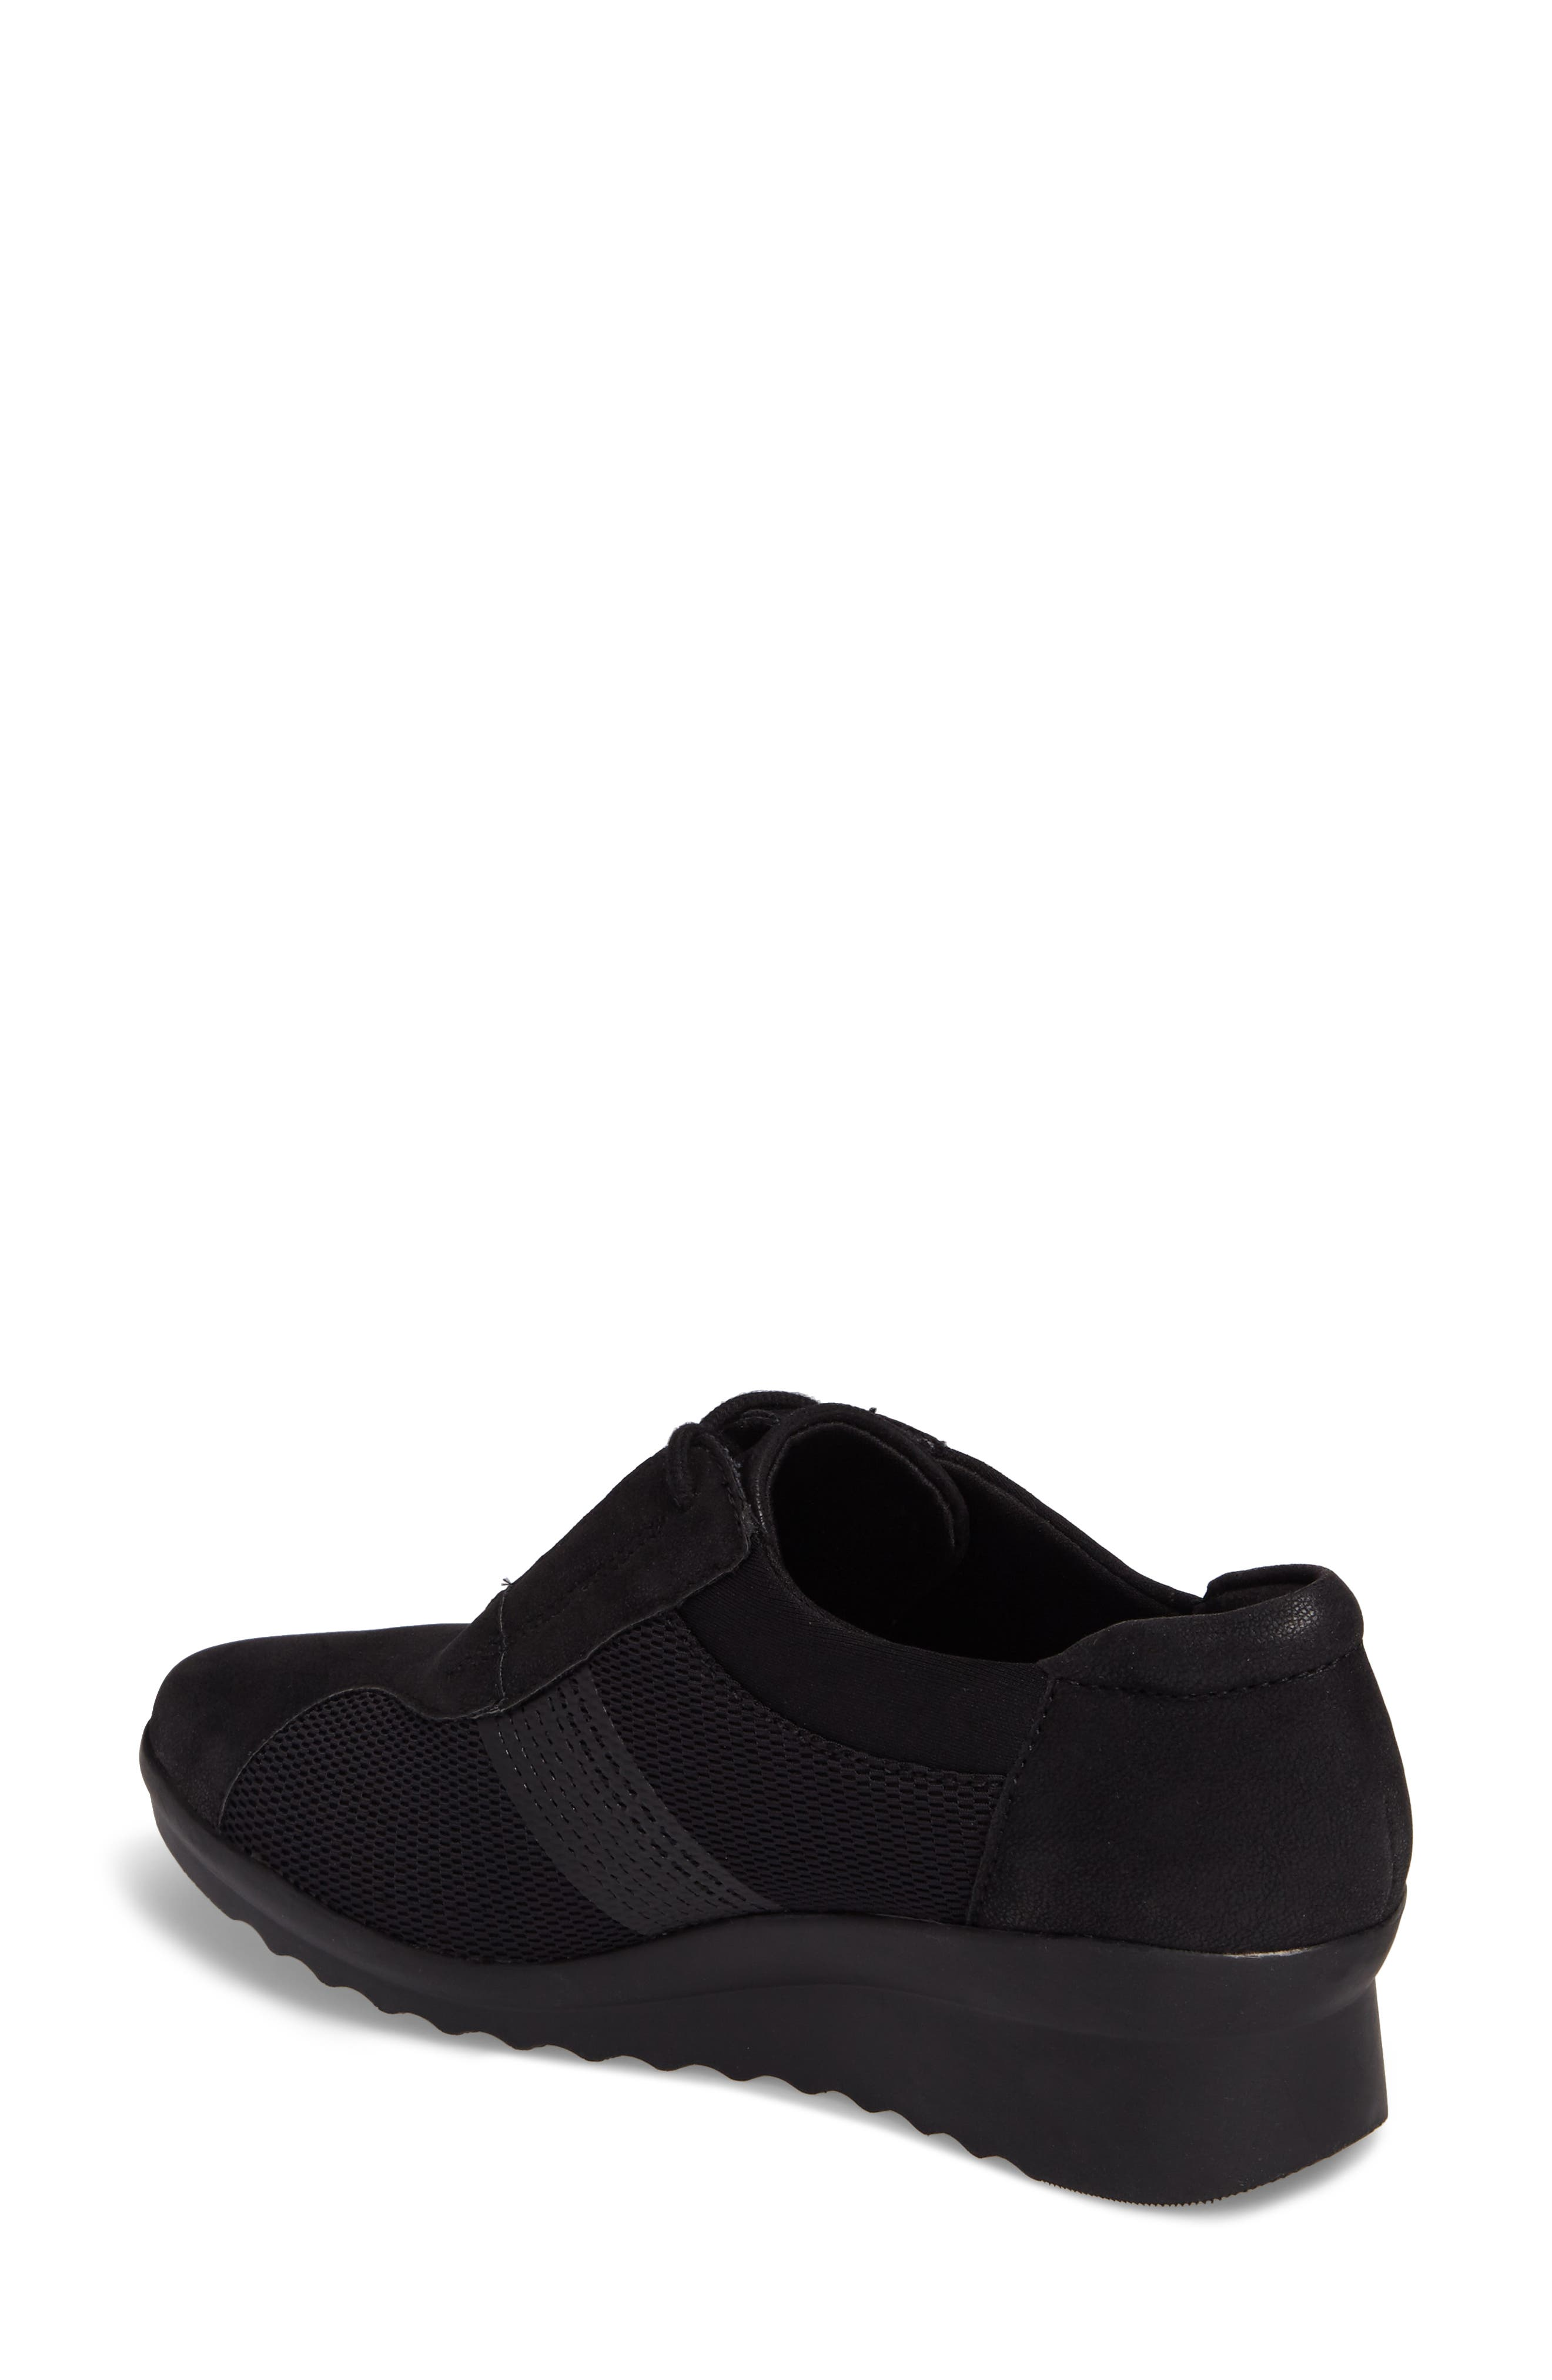 Caddell Fly Sneaker,                             Alternate thumbnail 2, color,                             BLACK FABRIC